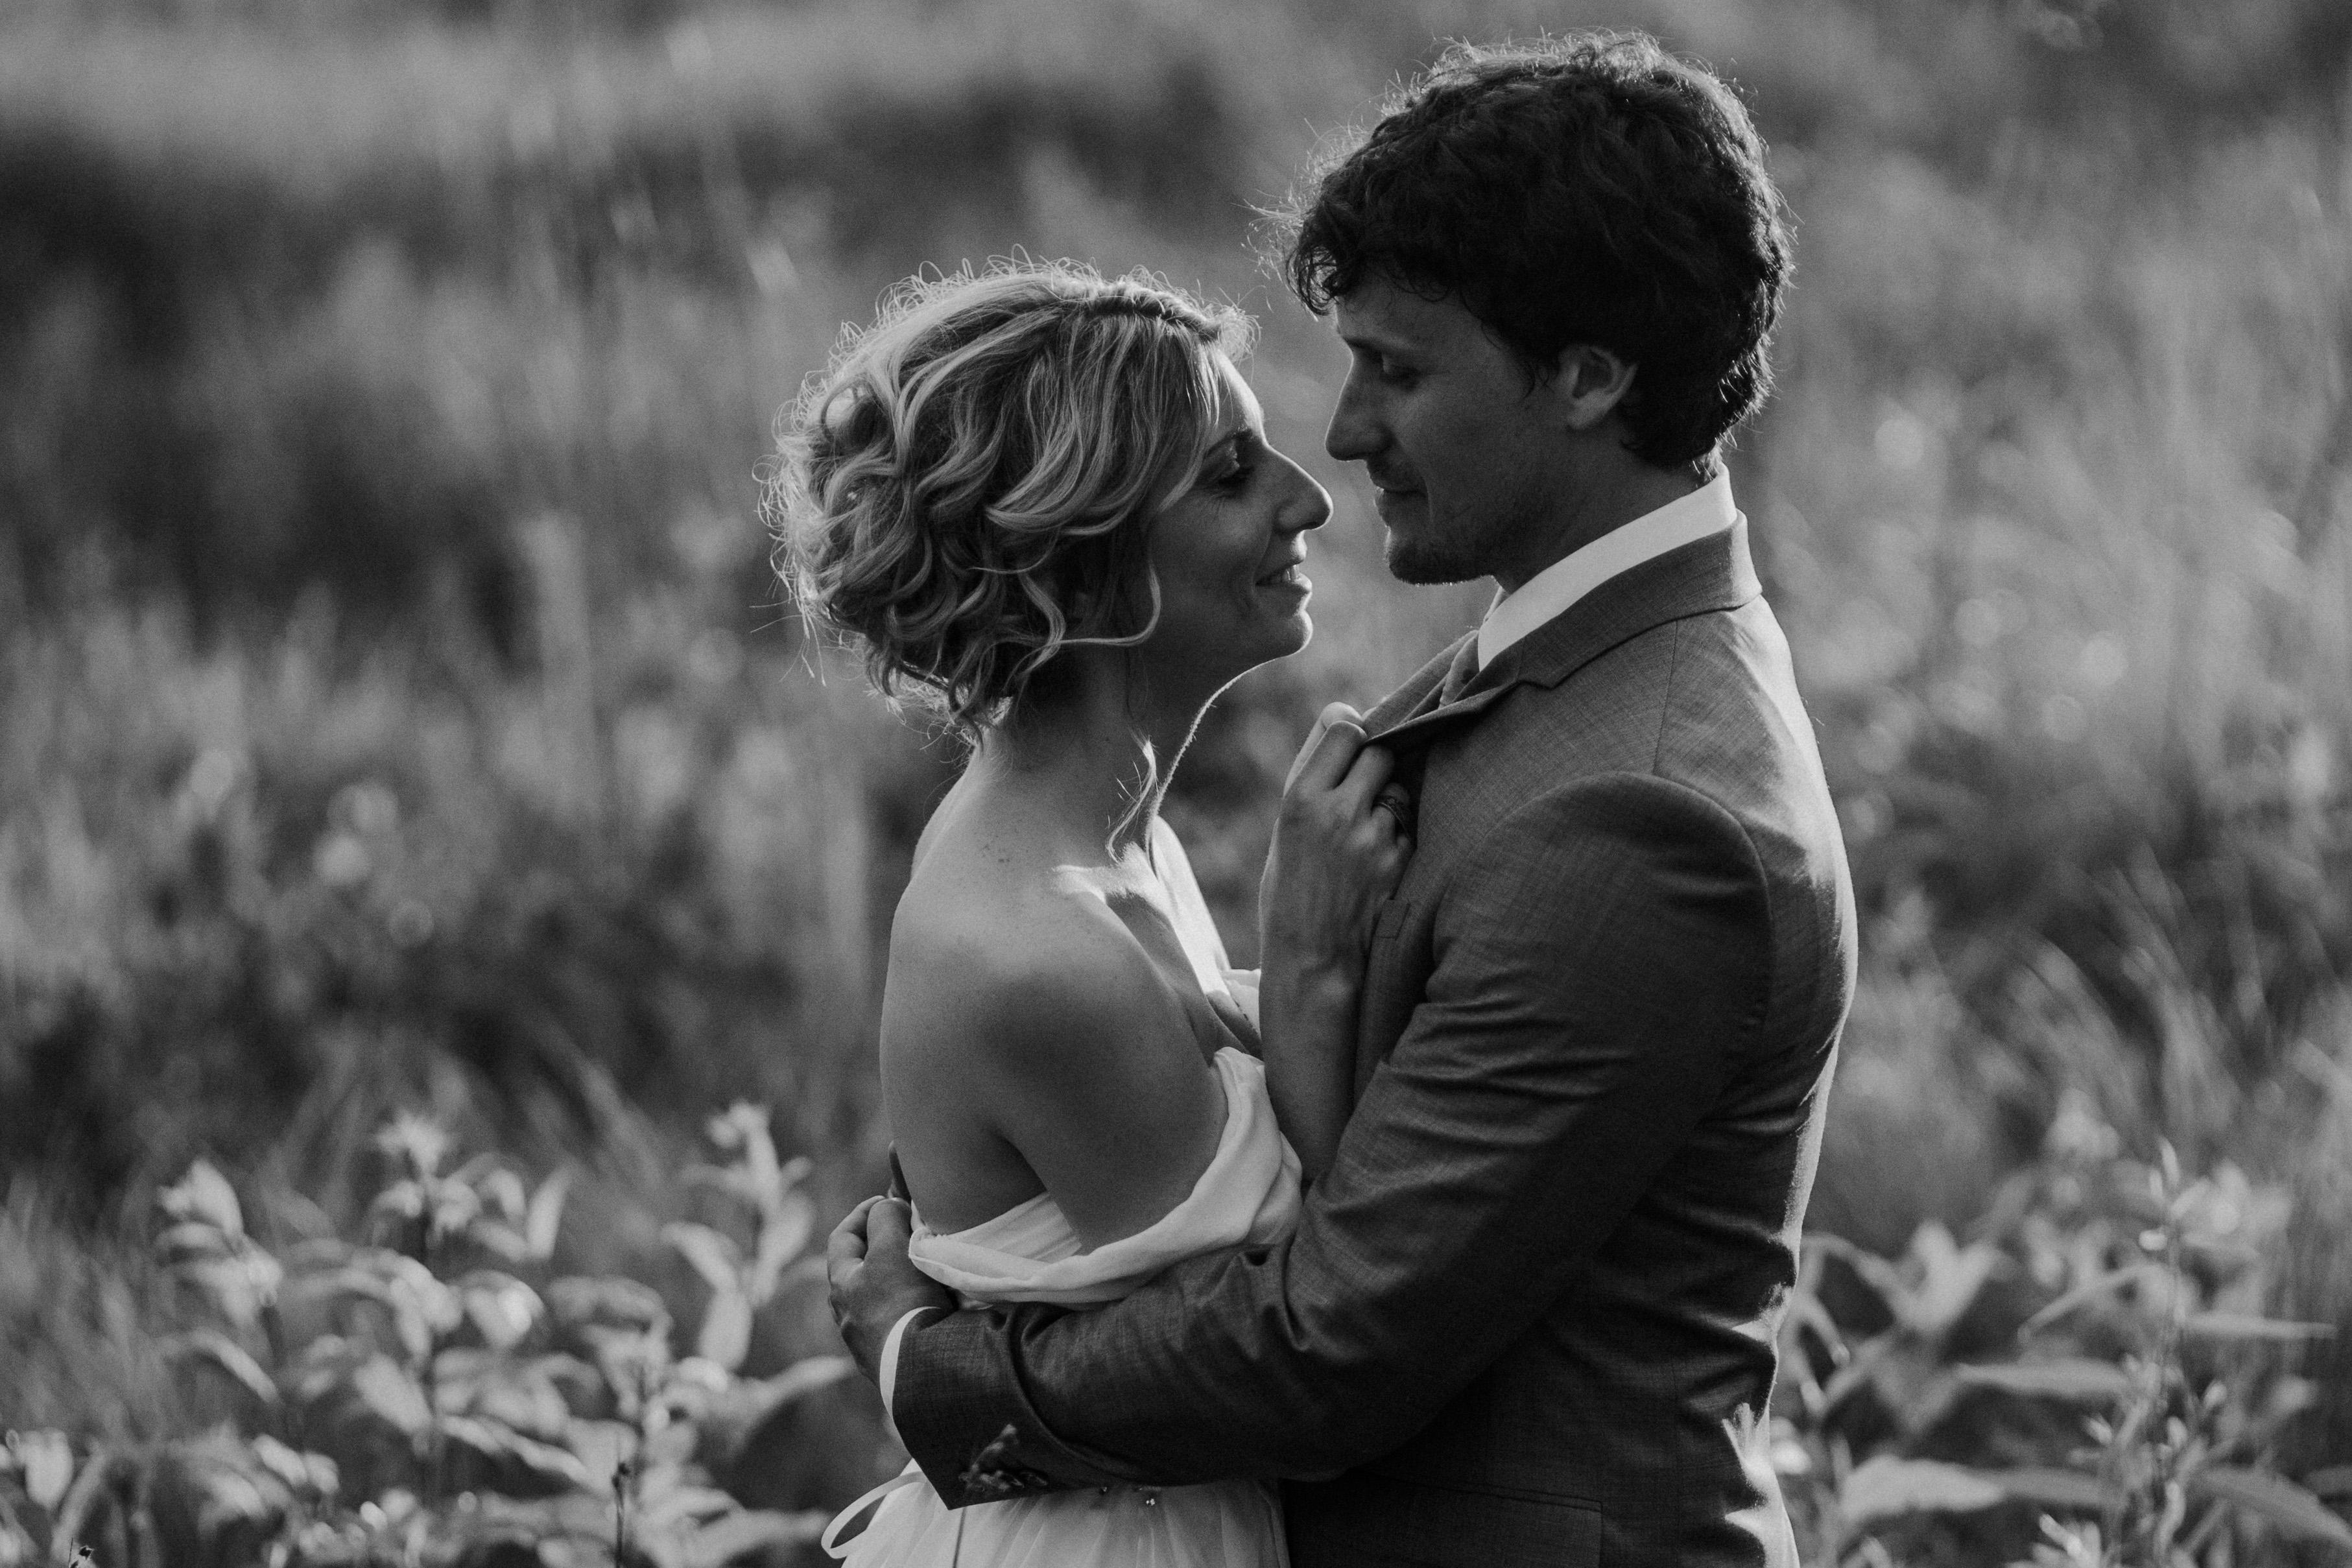 sunset cove intimate wedding photography michigan